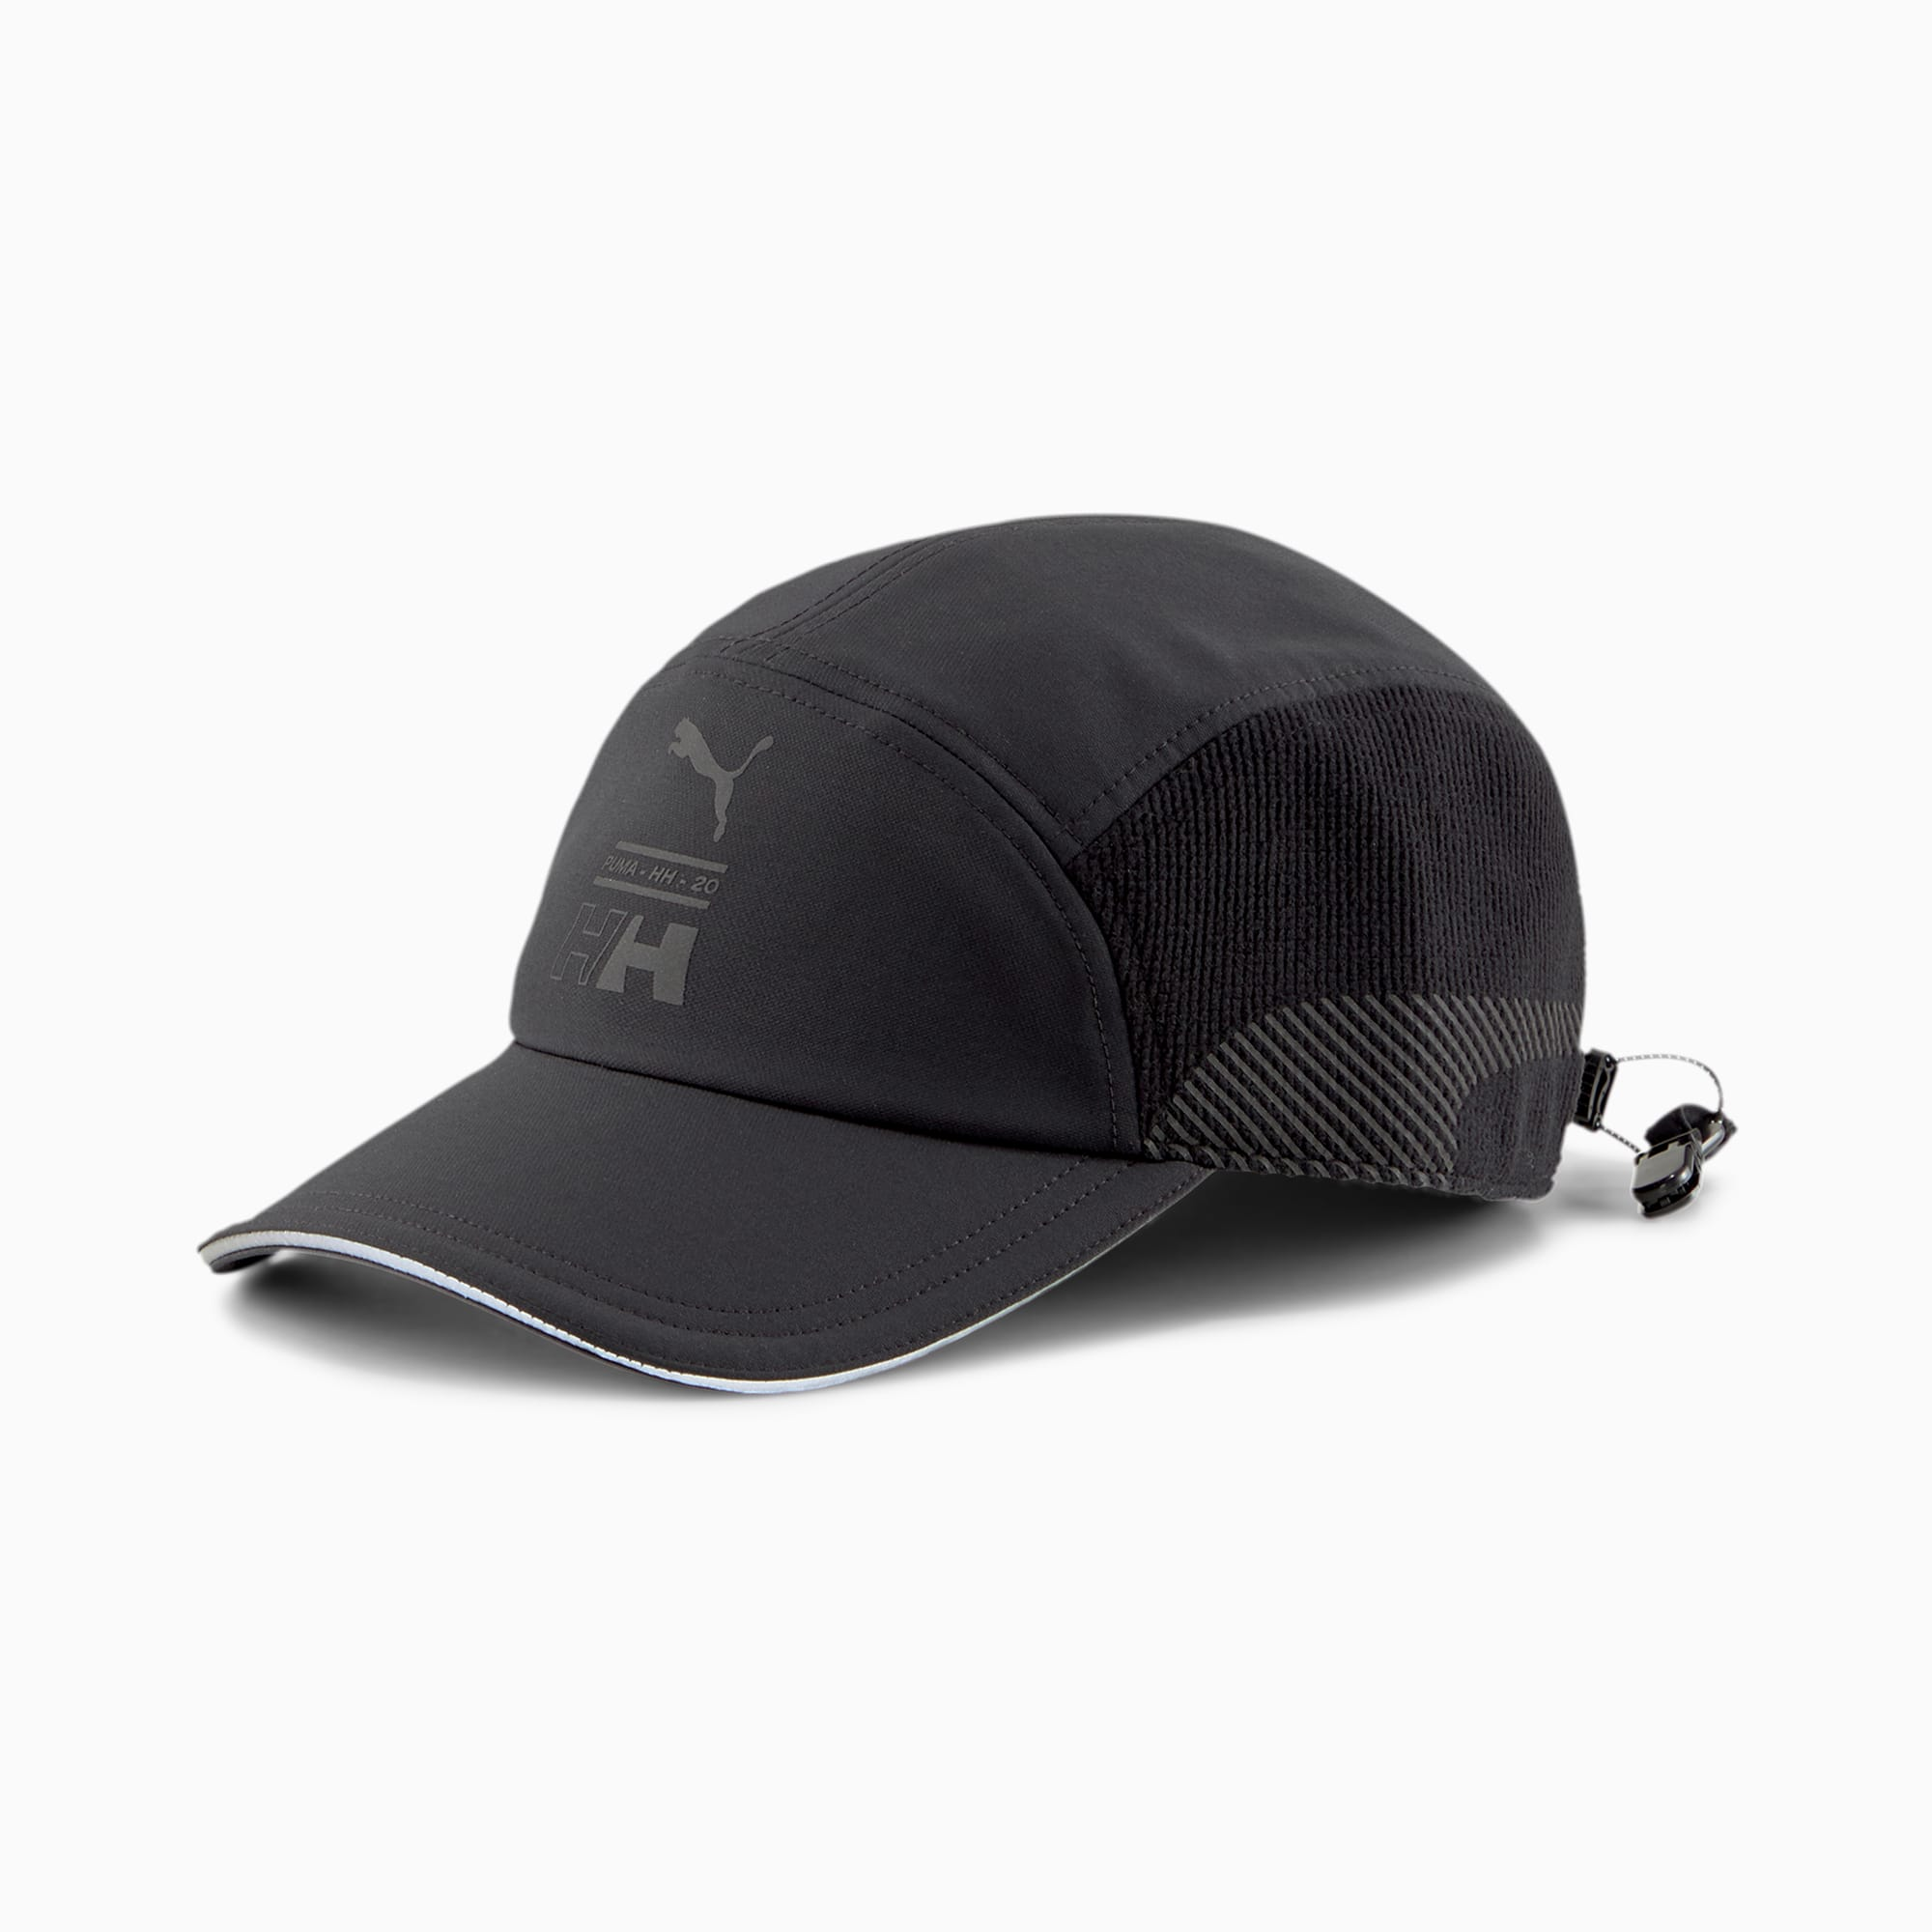 Casquette  x helly hansen, noir, accessoires